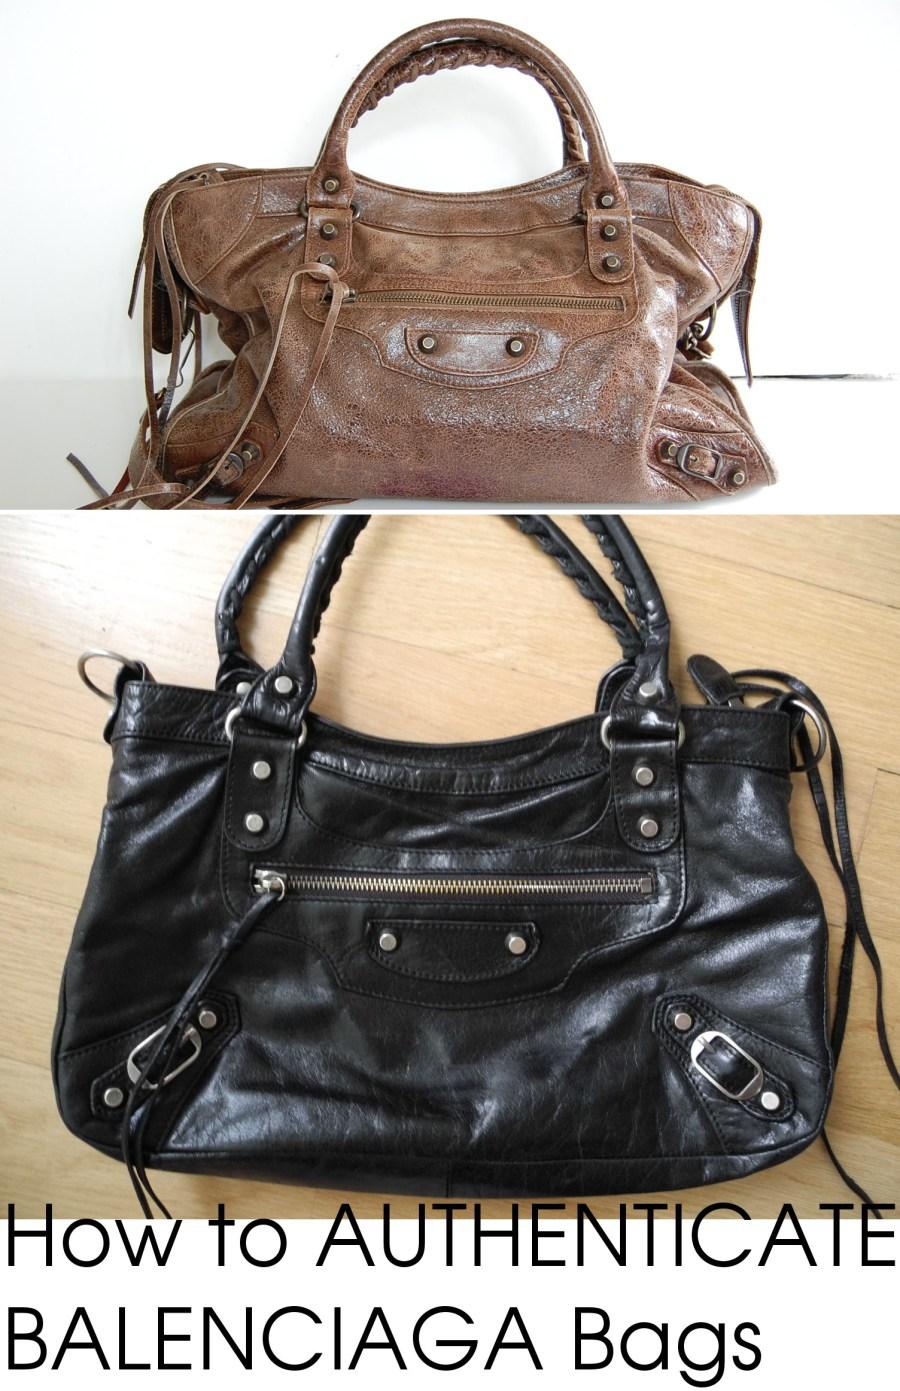 Easy Louis Vuitton Bag Authentication Guide Lollipuff >> Authenticate Balenciaga Handbags Closet Full Of Cash